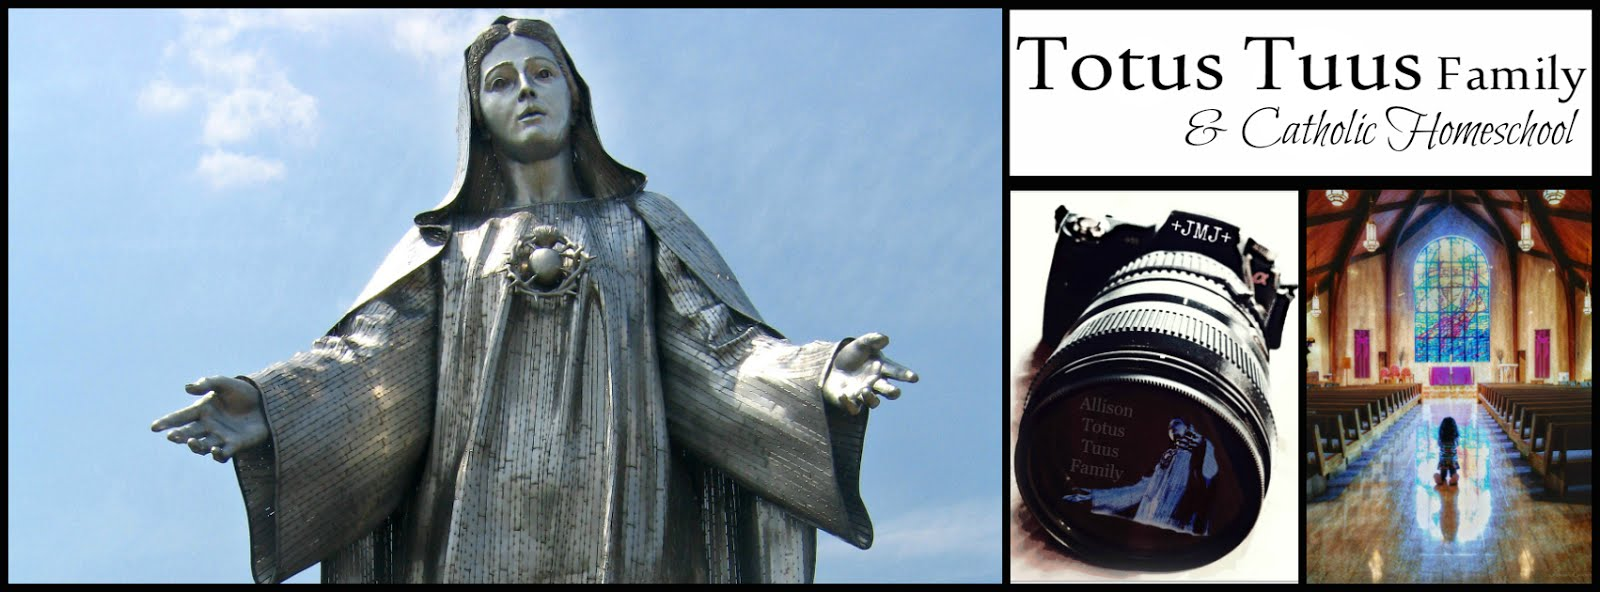 He Held Jesus In His Arms St Joseph Totus Tuus Family